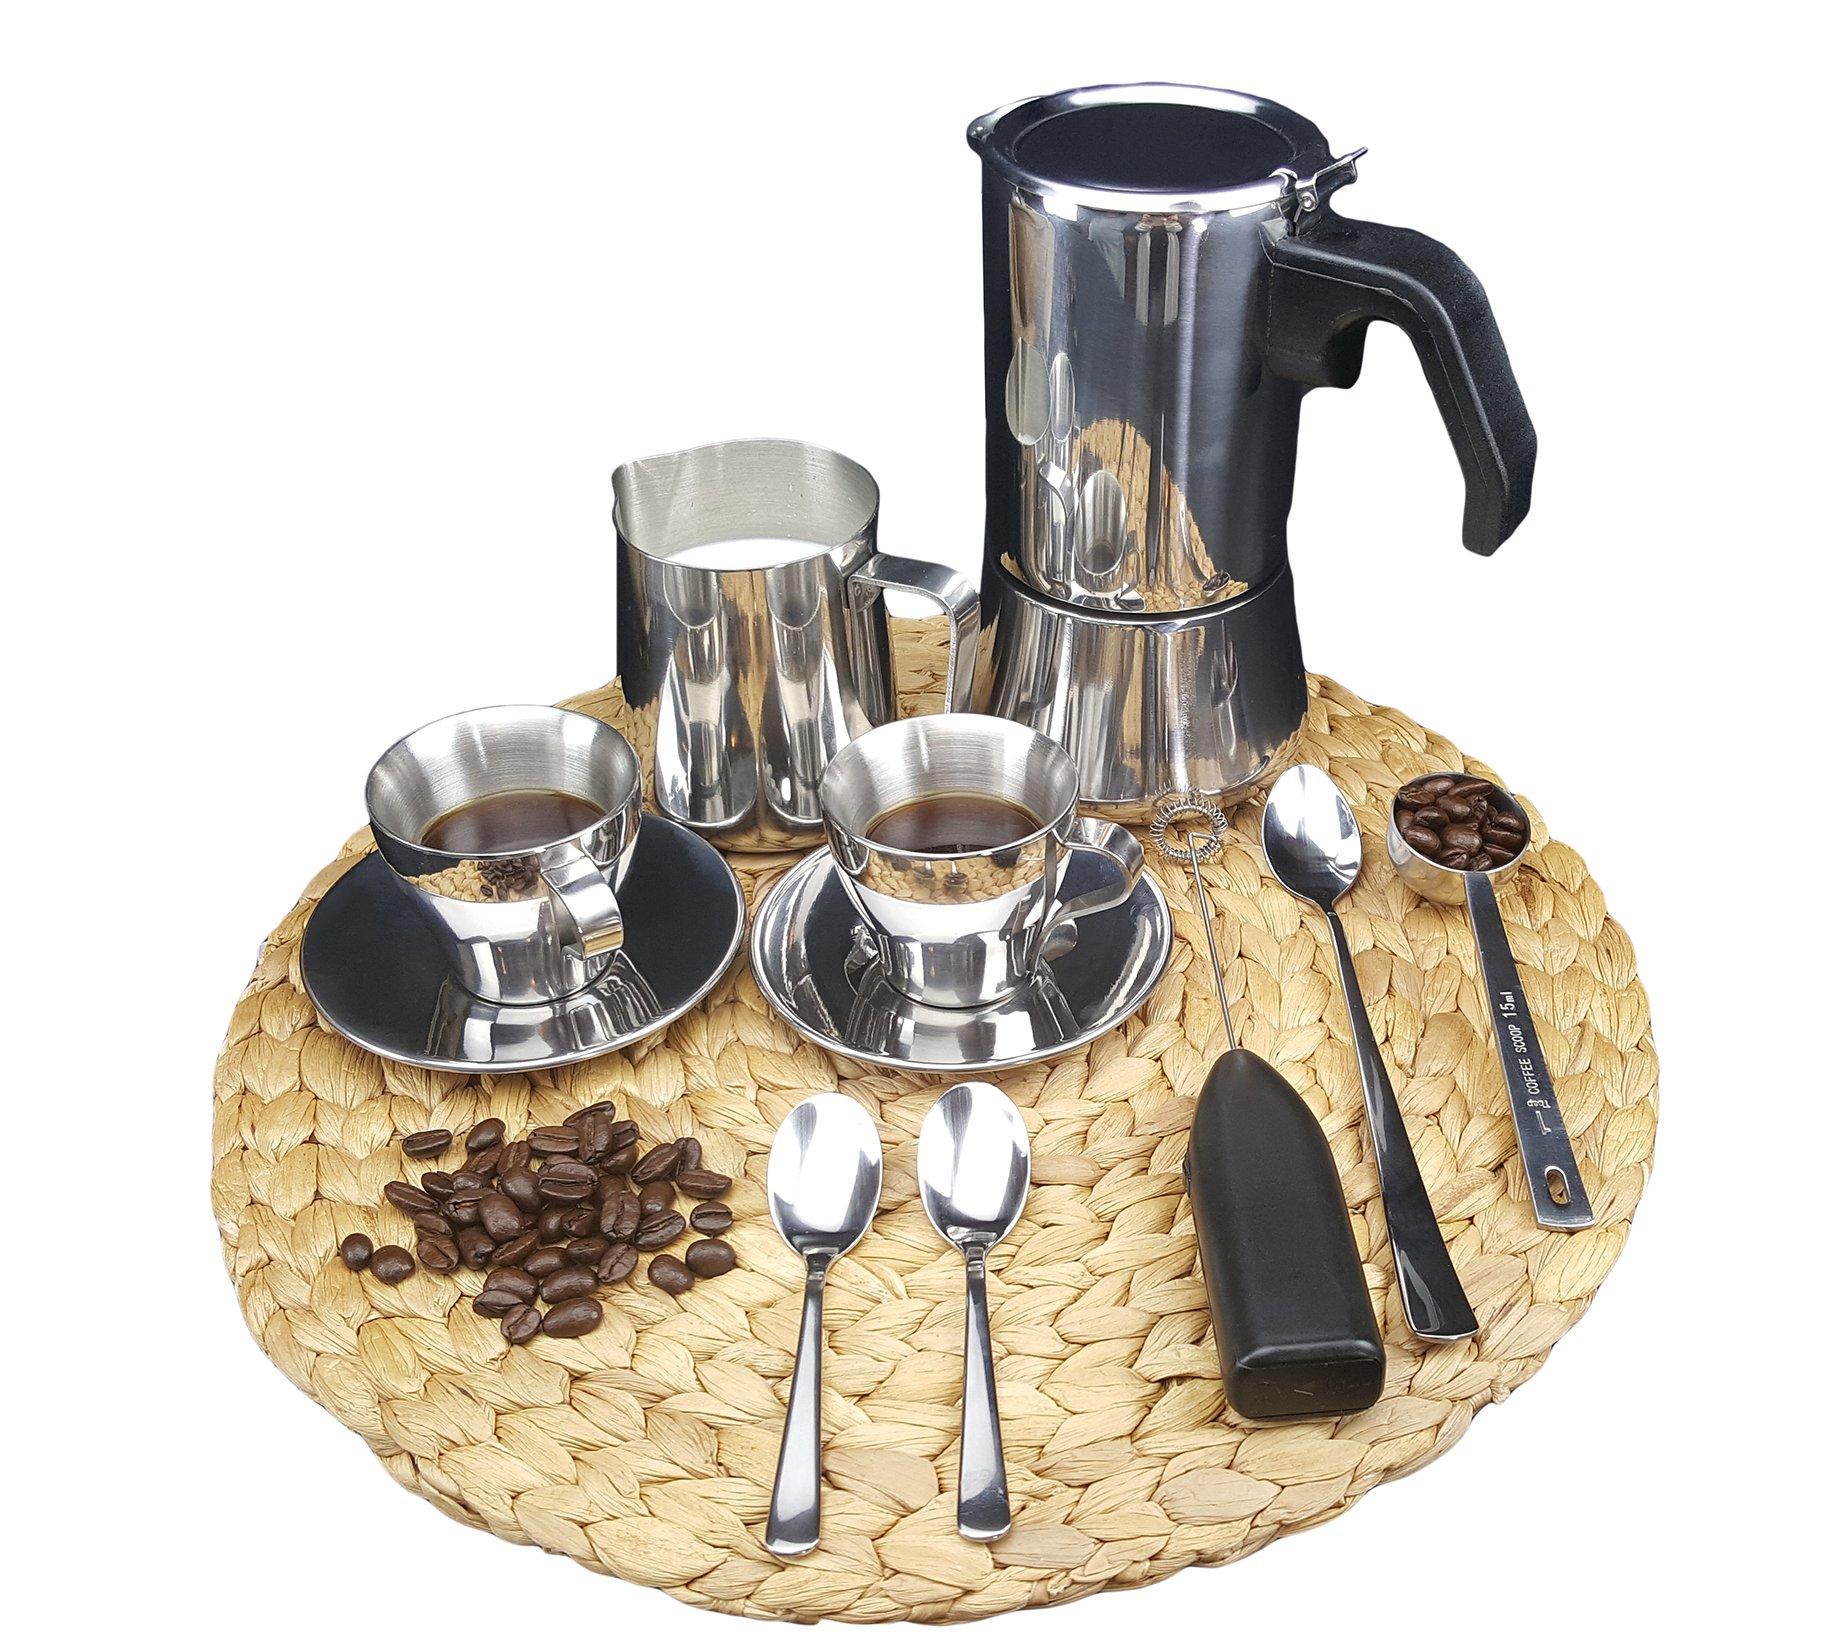 IKEA Metal Espresso Moka Pot Gift Set: Espresso Pot, Milk Frothing Pitcher, Handheld Milk Frother, Measuring Spoon [Bundle] by Signature Home Kitchen